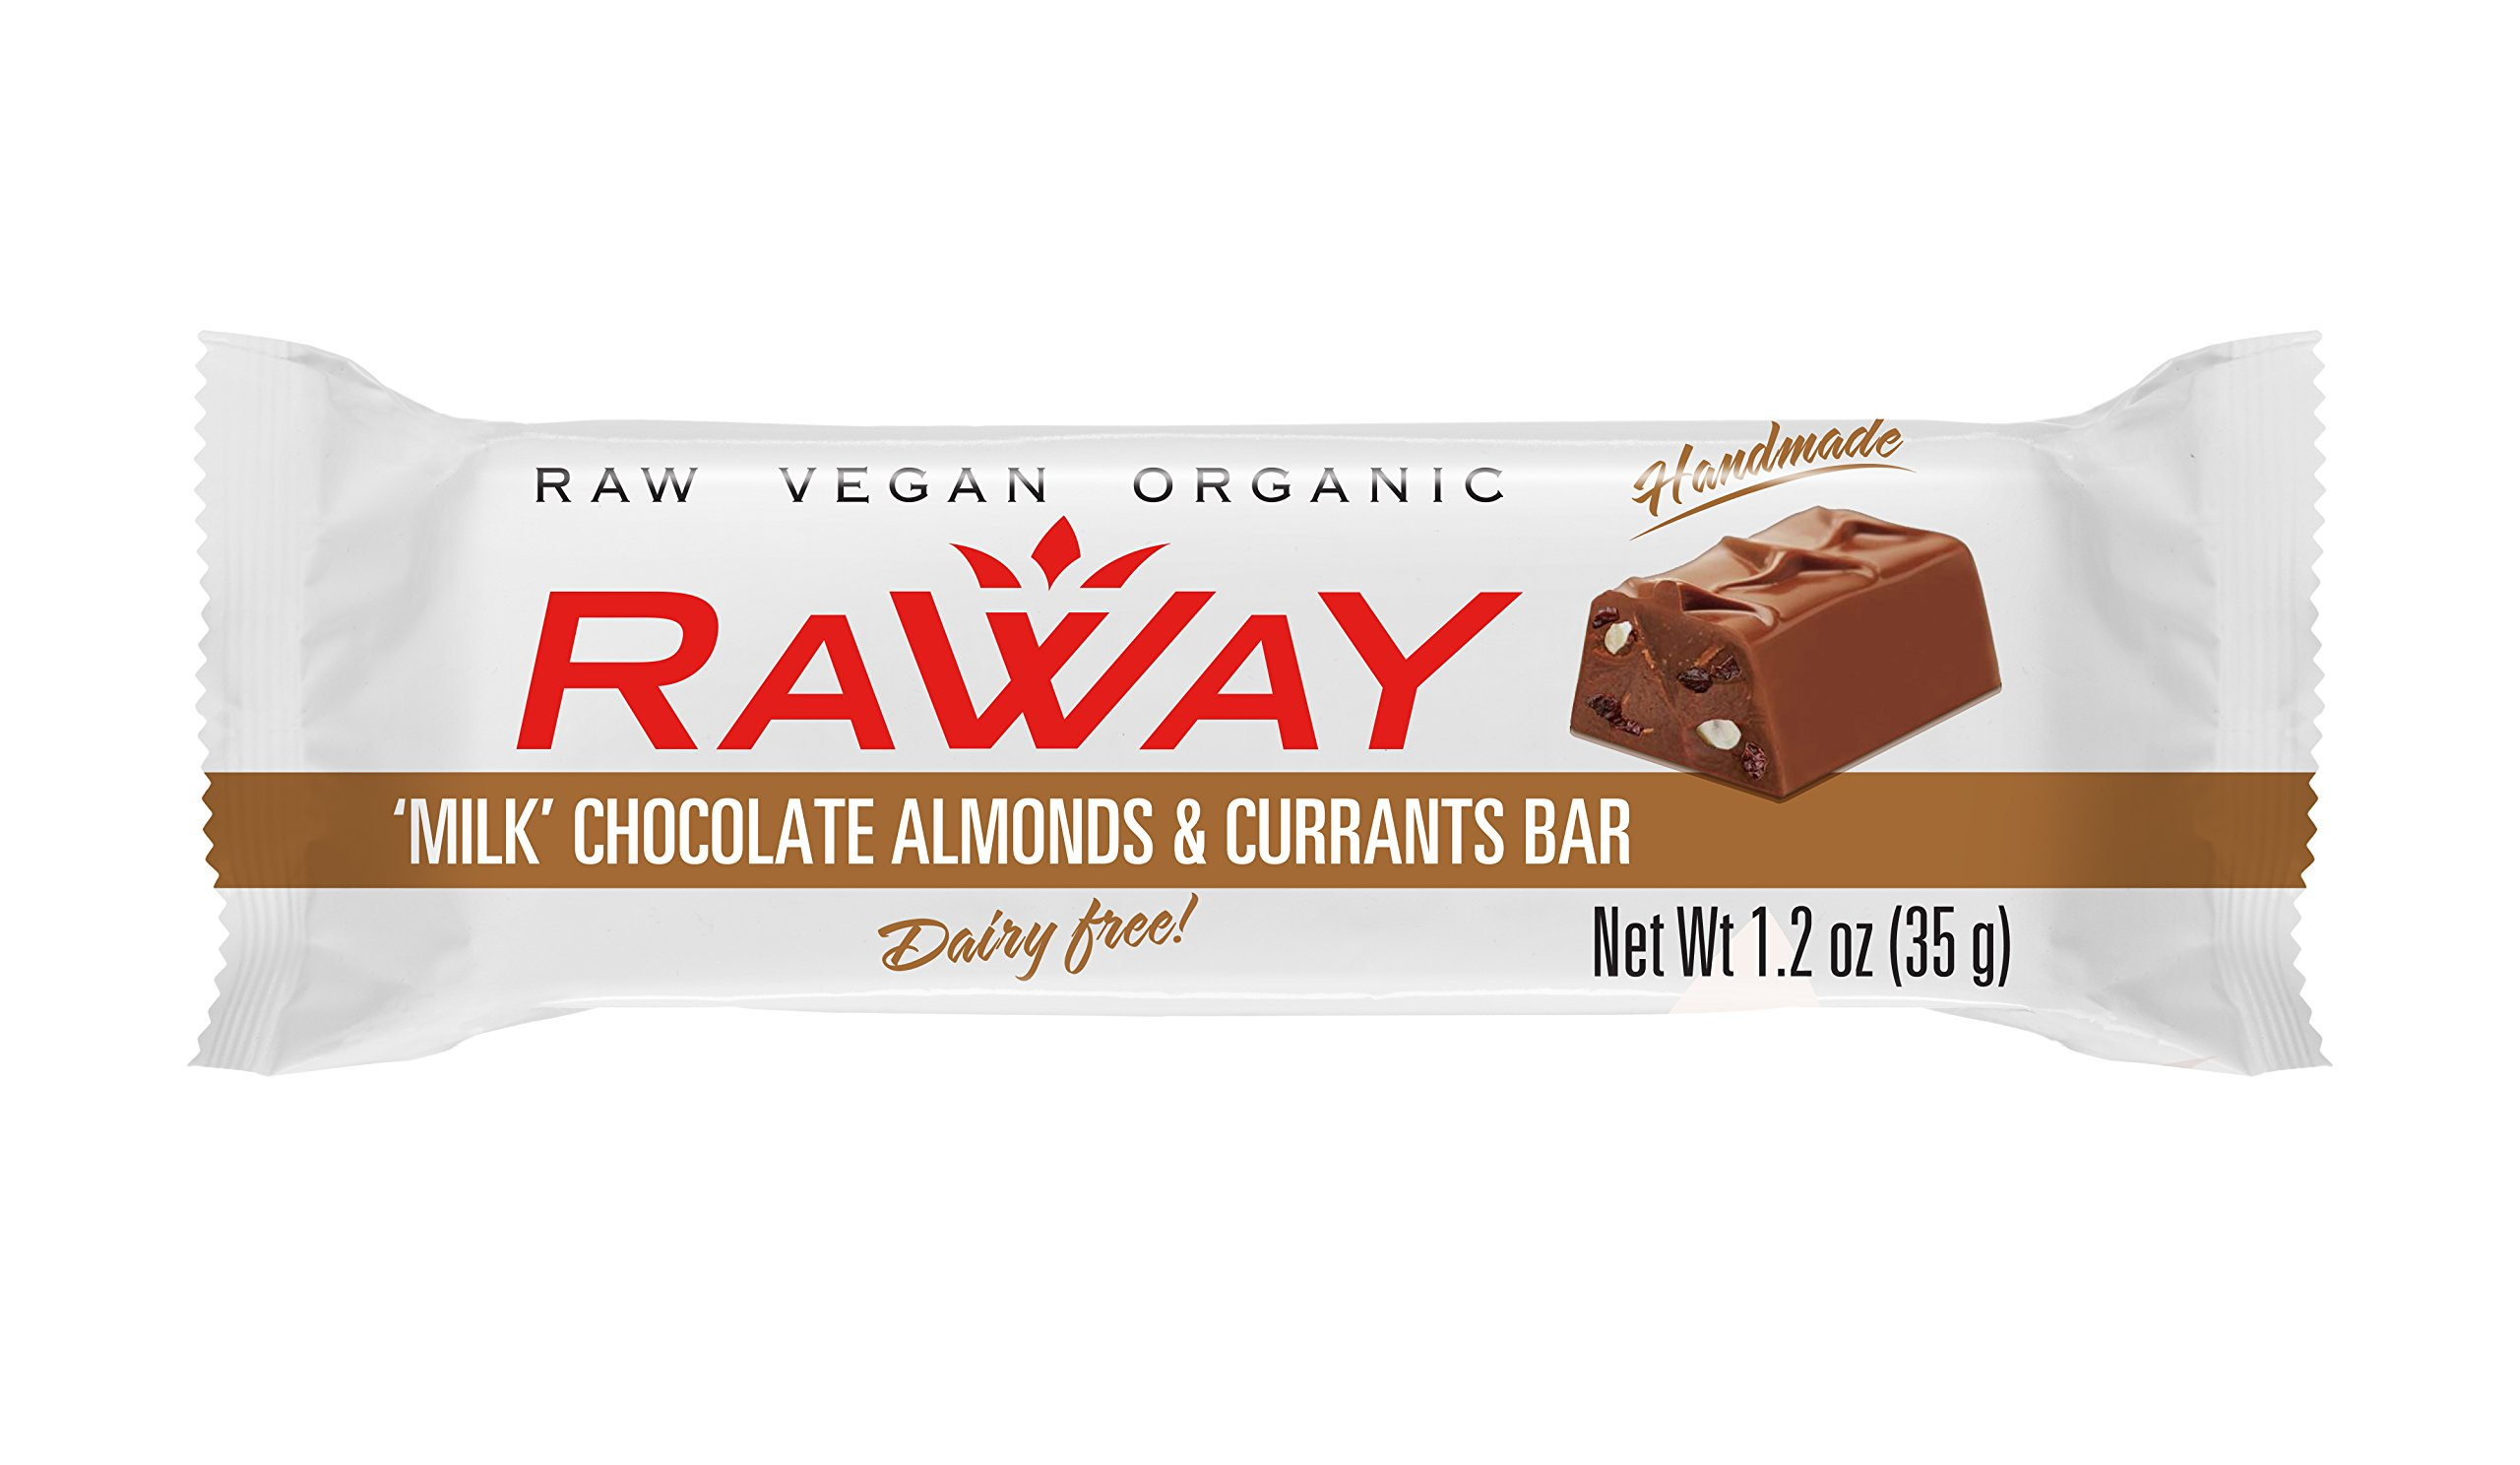 Raway Raw Vegan Chocolate Bars - Milk Chocolate Almonds & Currants - Box 12 Bars